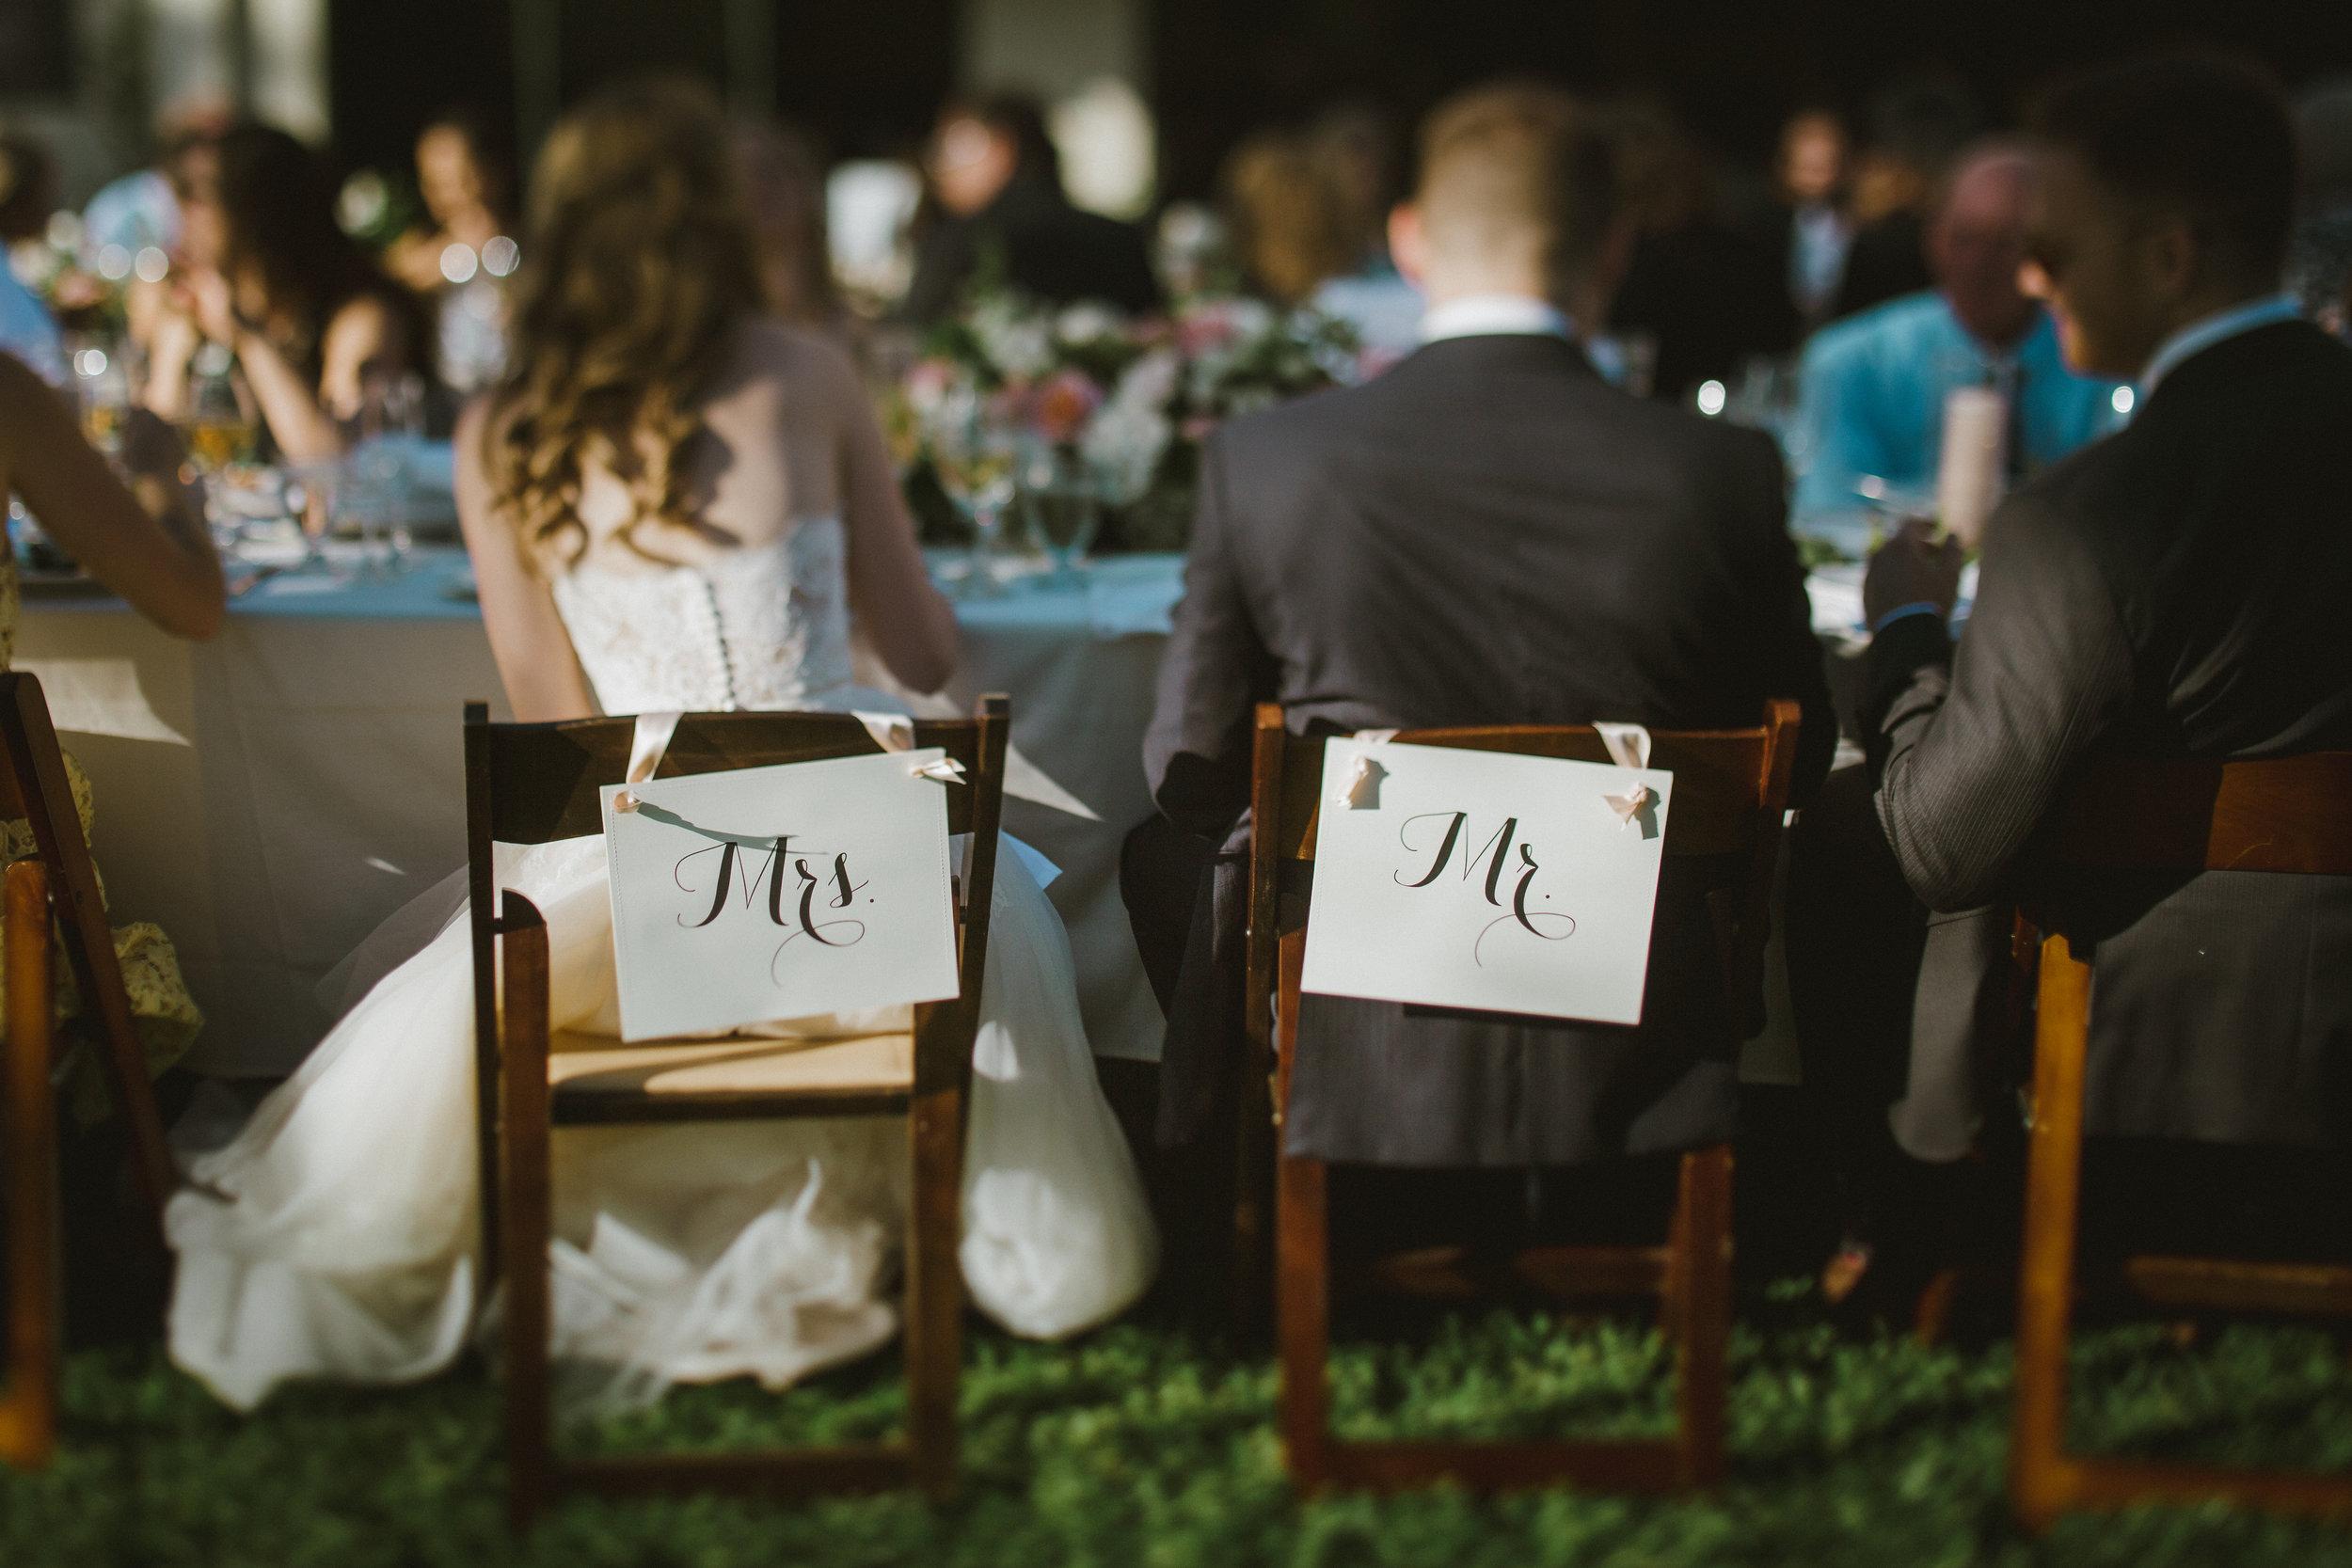 www.santabarbarawedding.com | Ryanne Bee Photography | The Santa Barbara Club | Mr. and Mrs. Table Designations